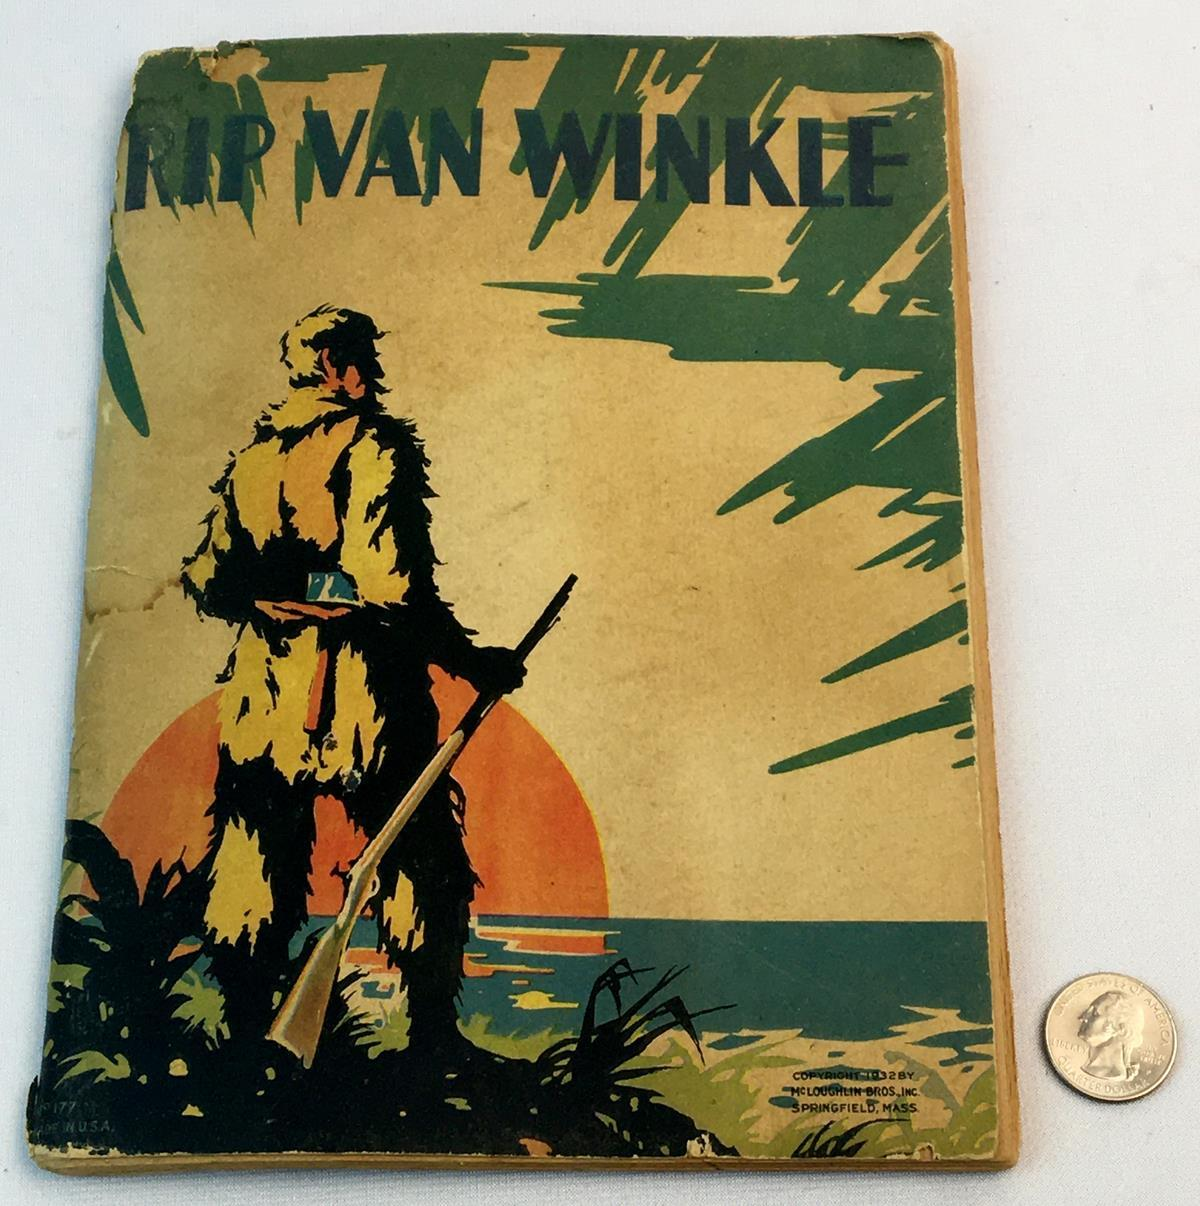 1932 Rip Van Winkle by Washington Irving ILLUSTRATED